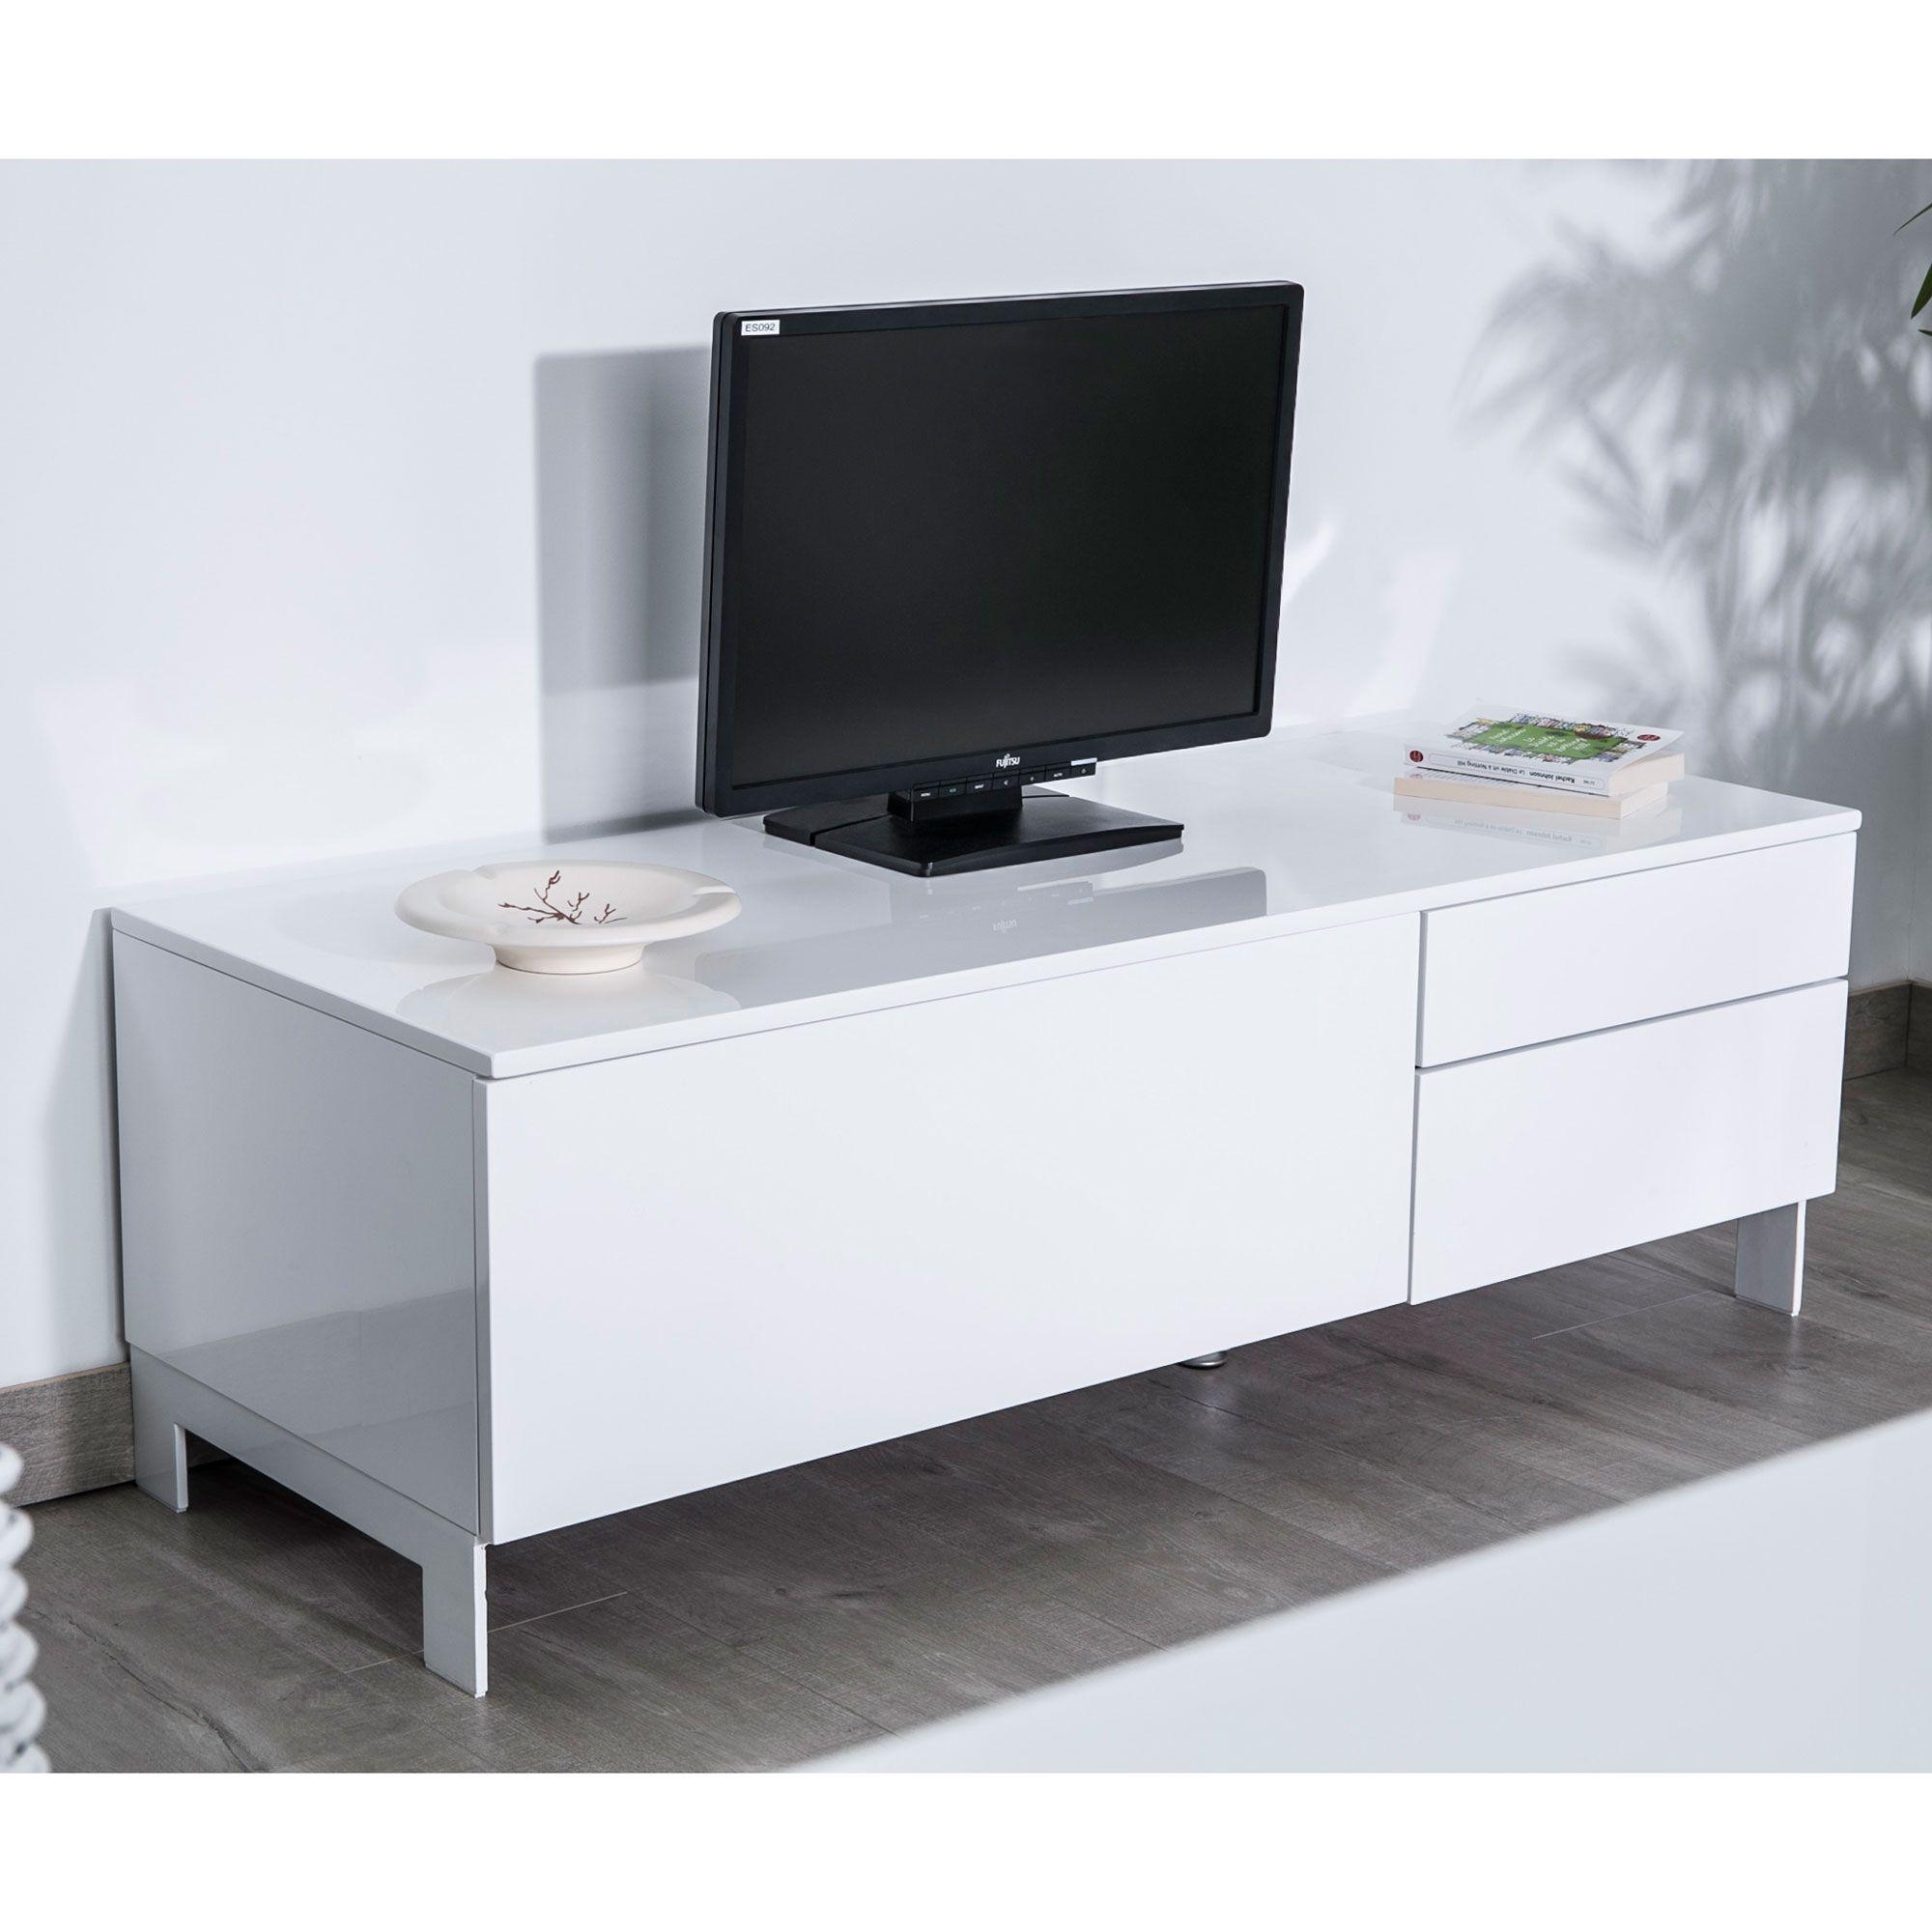 Tonnant Meuble Tv Avec Porte D Coration Fran Aise Pinterest  # Meuble Hifi Avec Porte Vitree